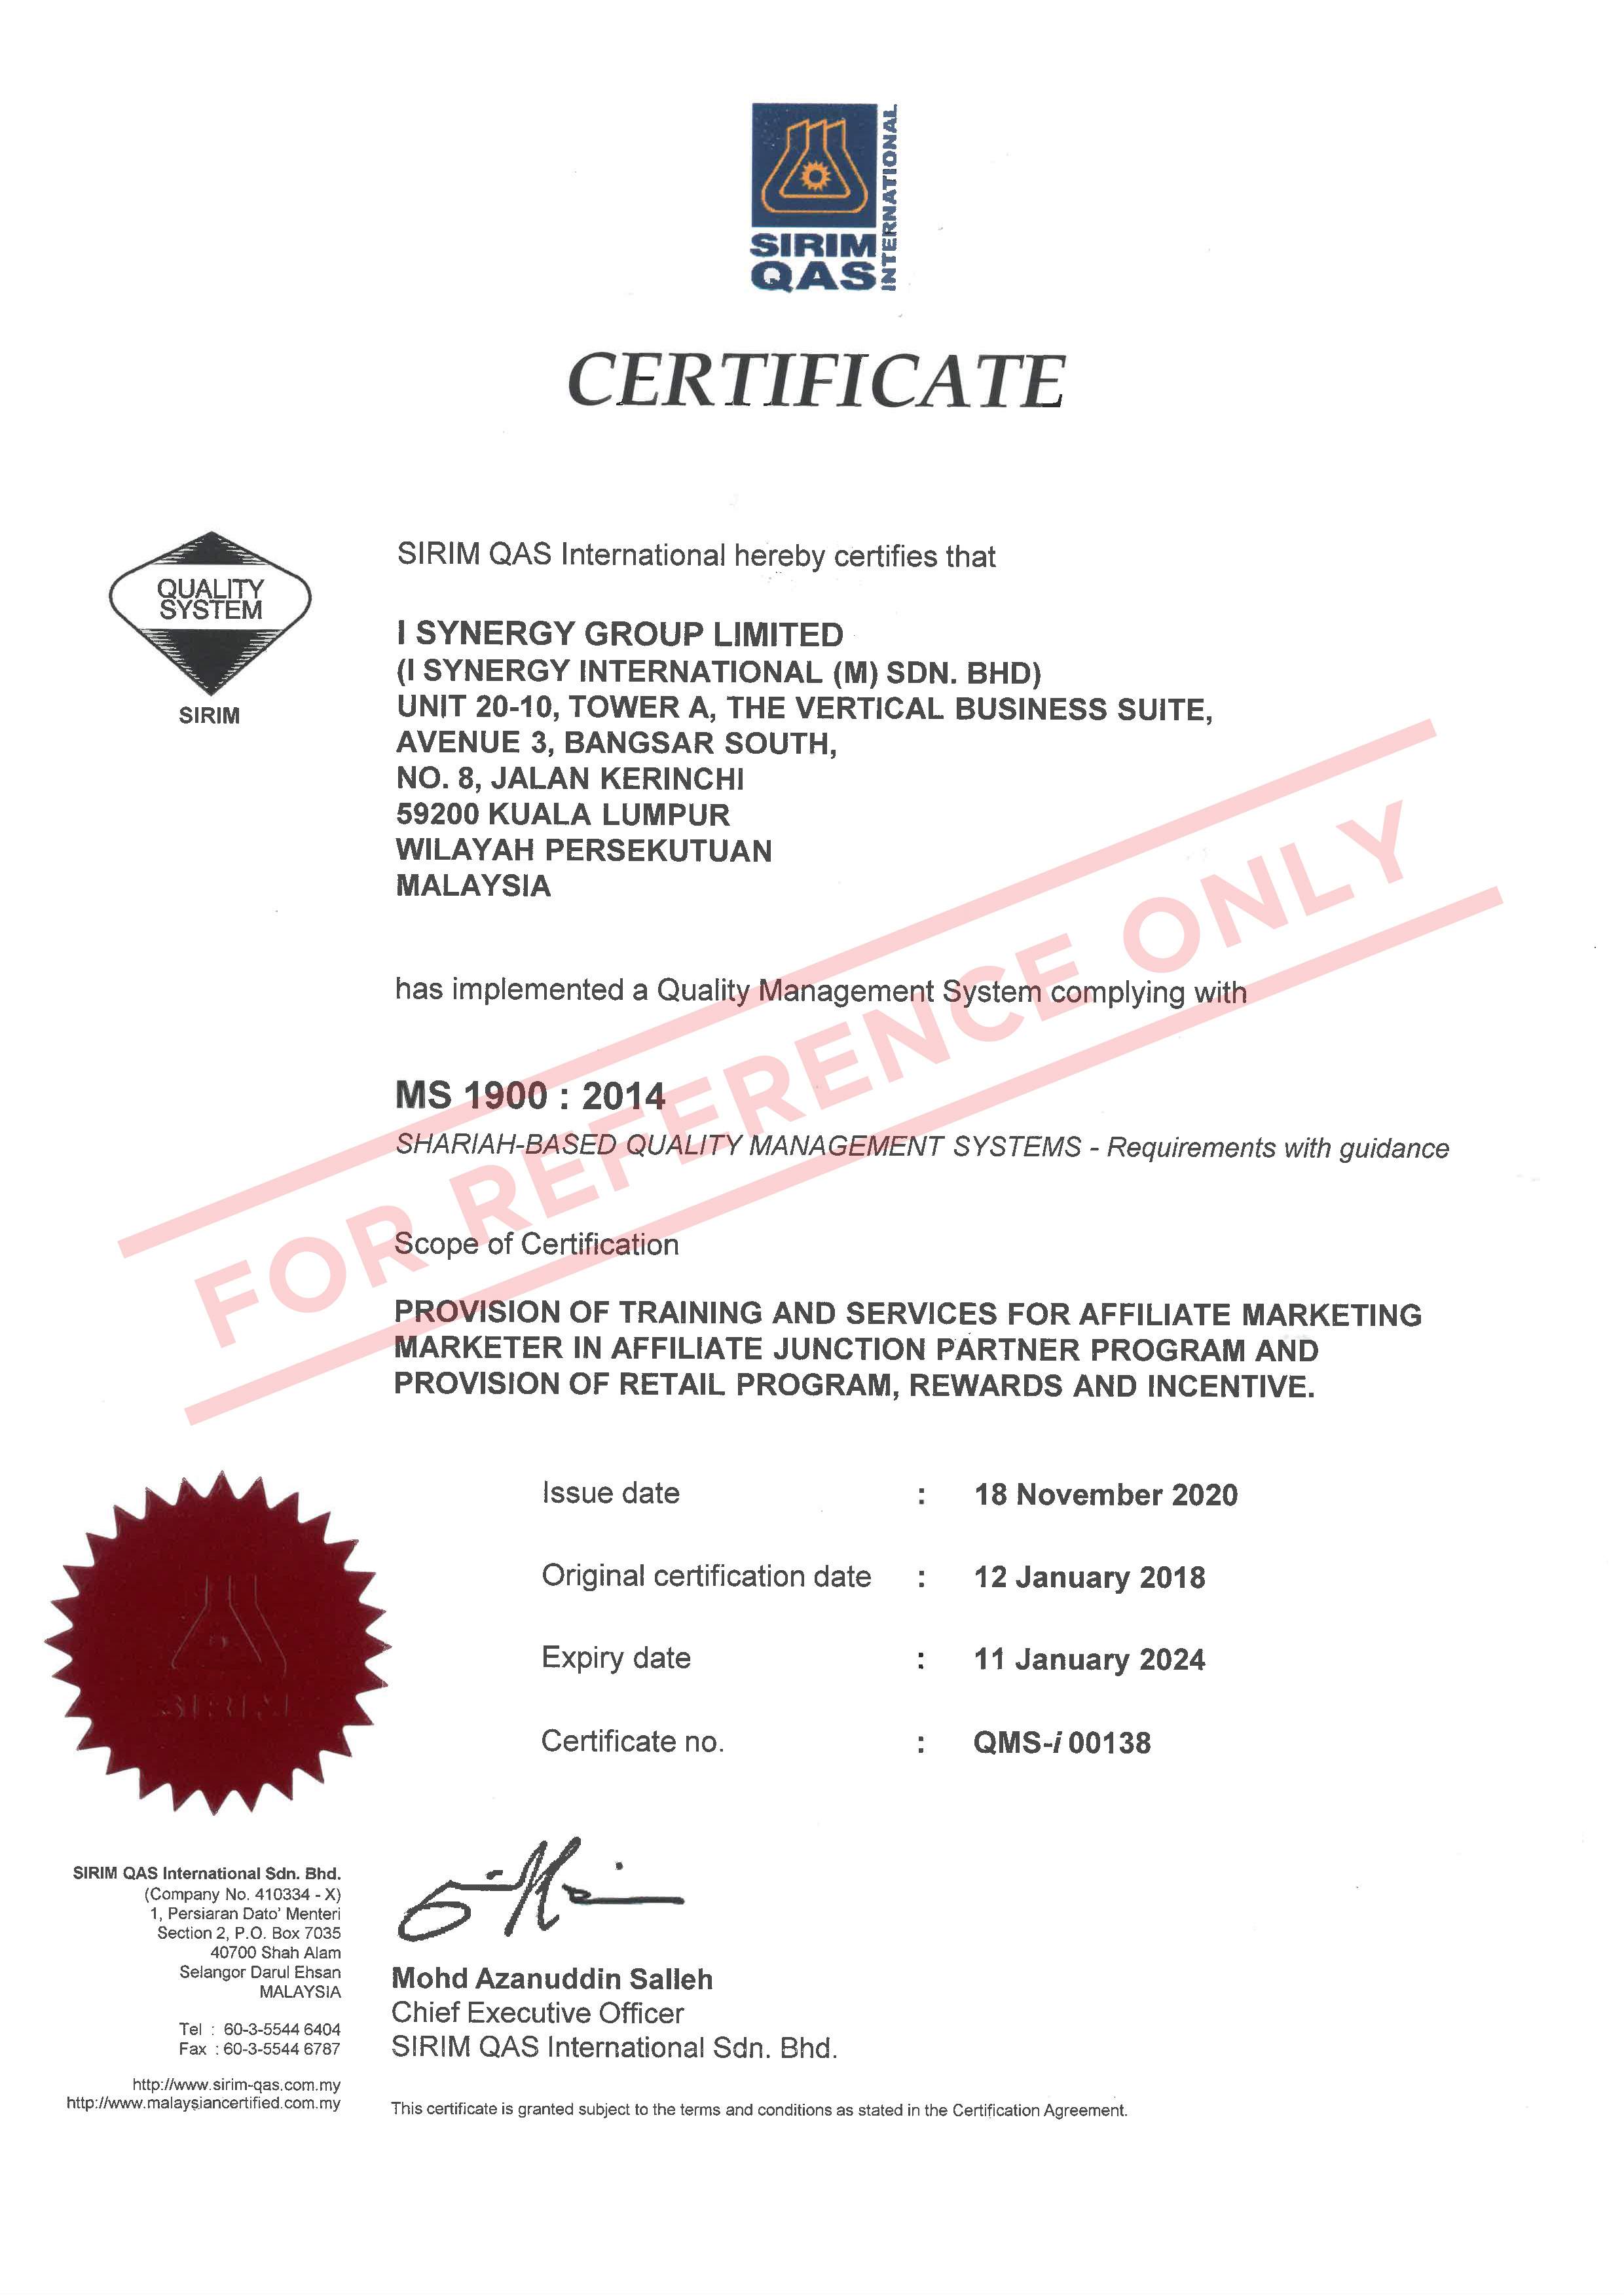 iSYNERGY-MS1900 New Cert 2021-2024-01